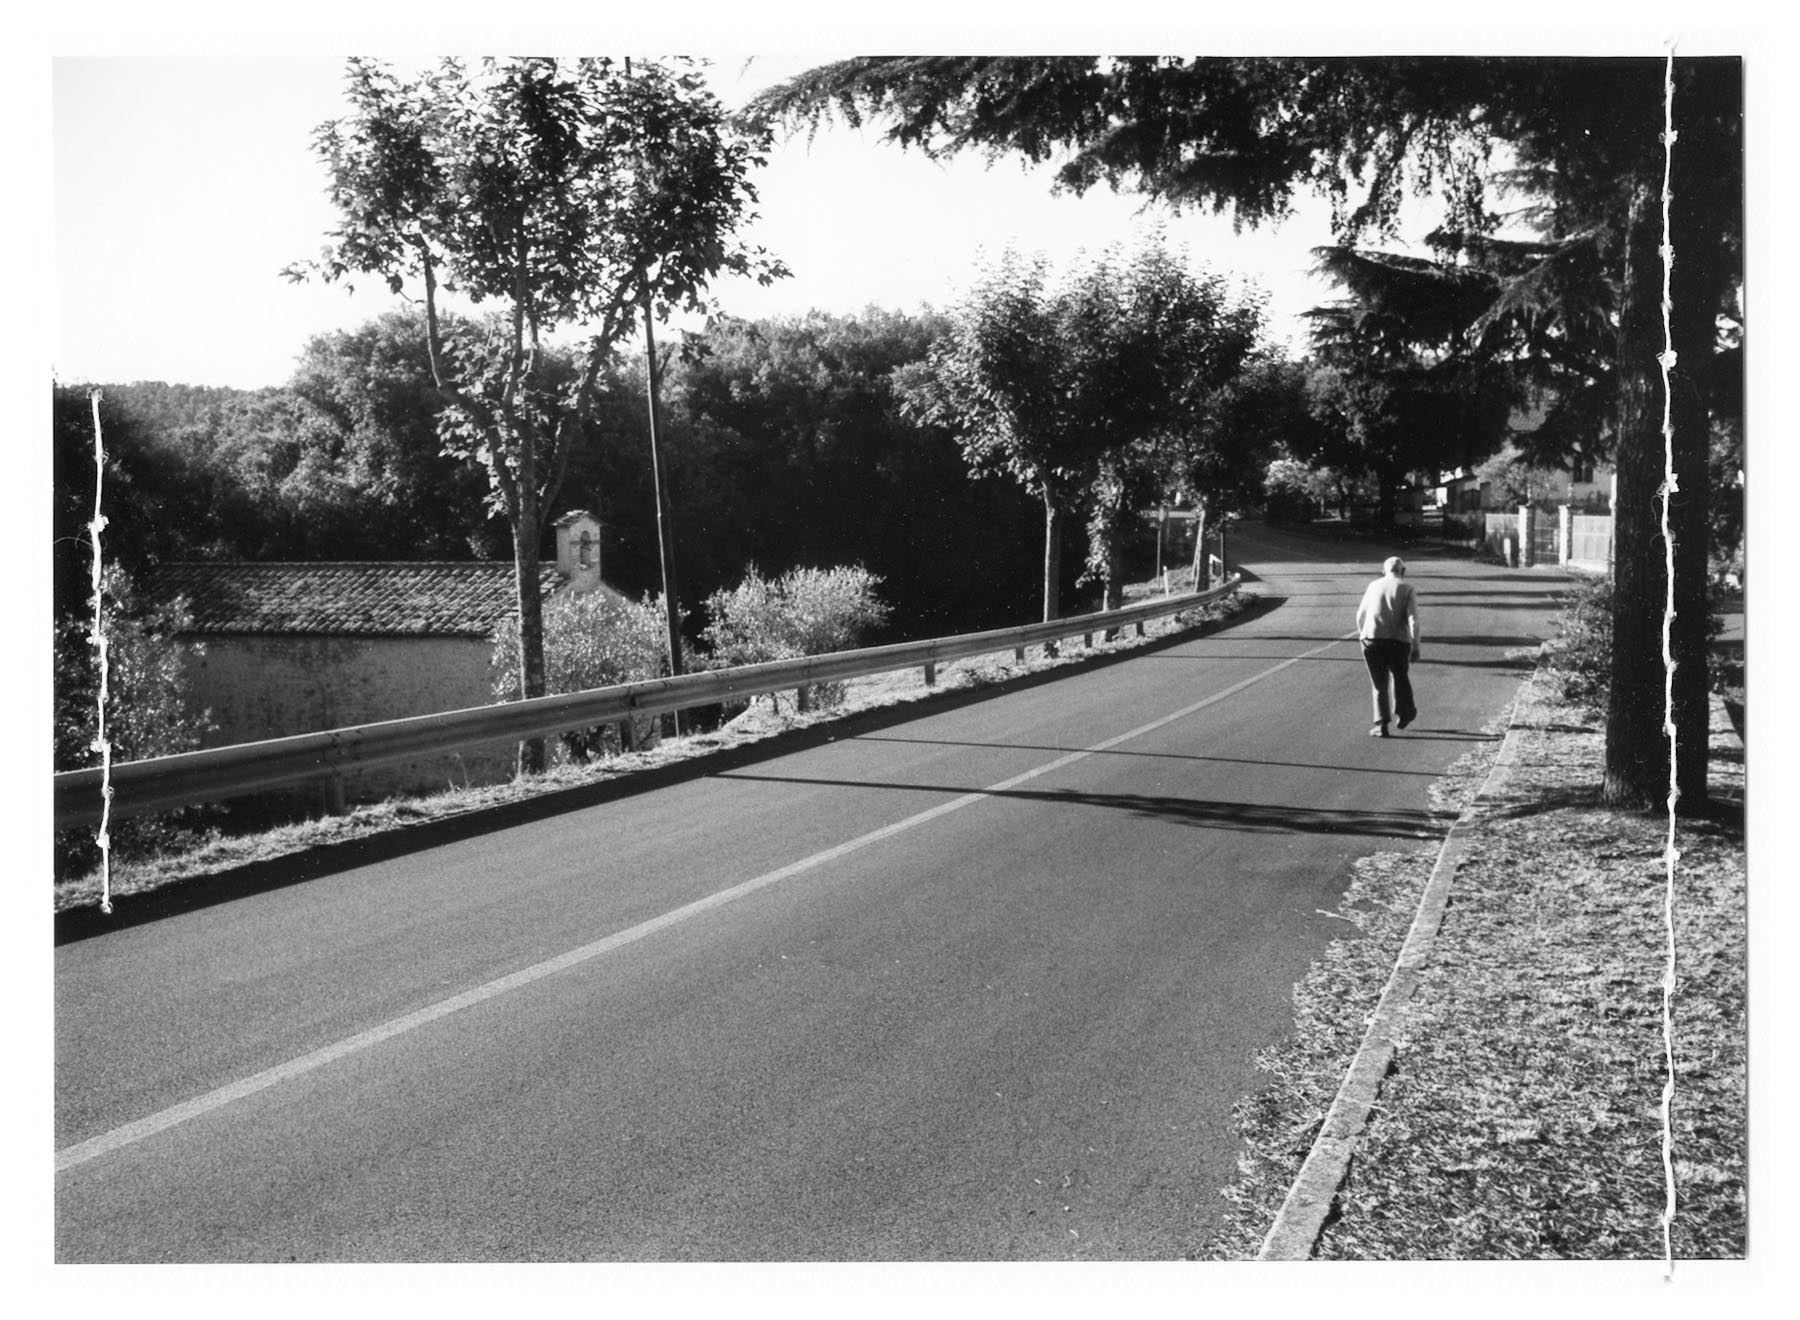 Stream of Life, No. 12 Via Alberto Carlo